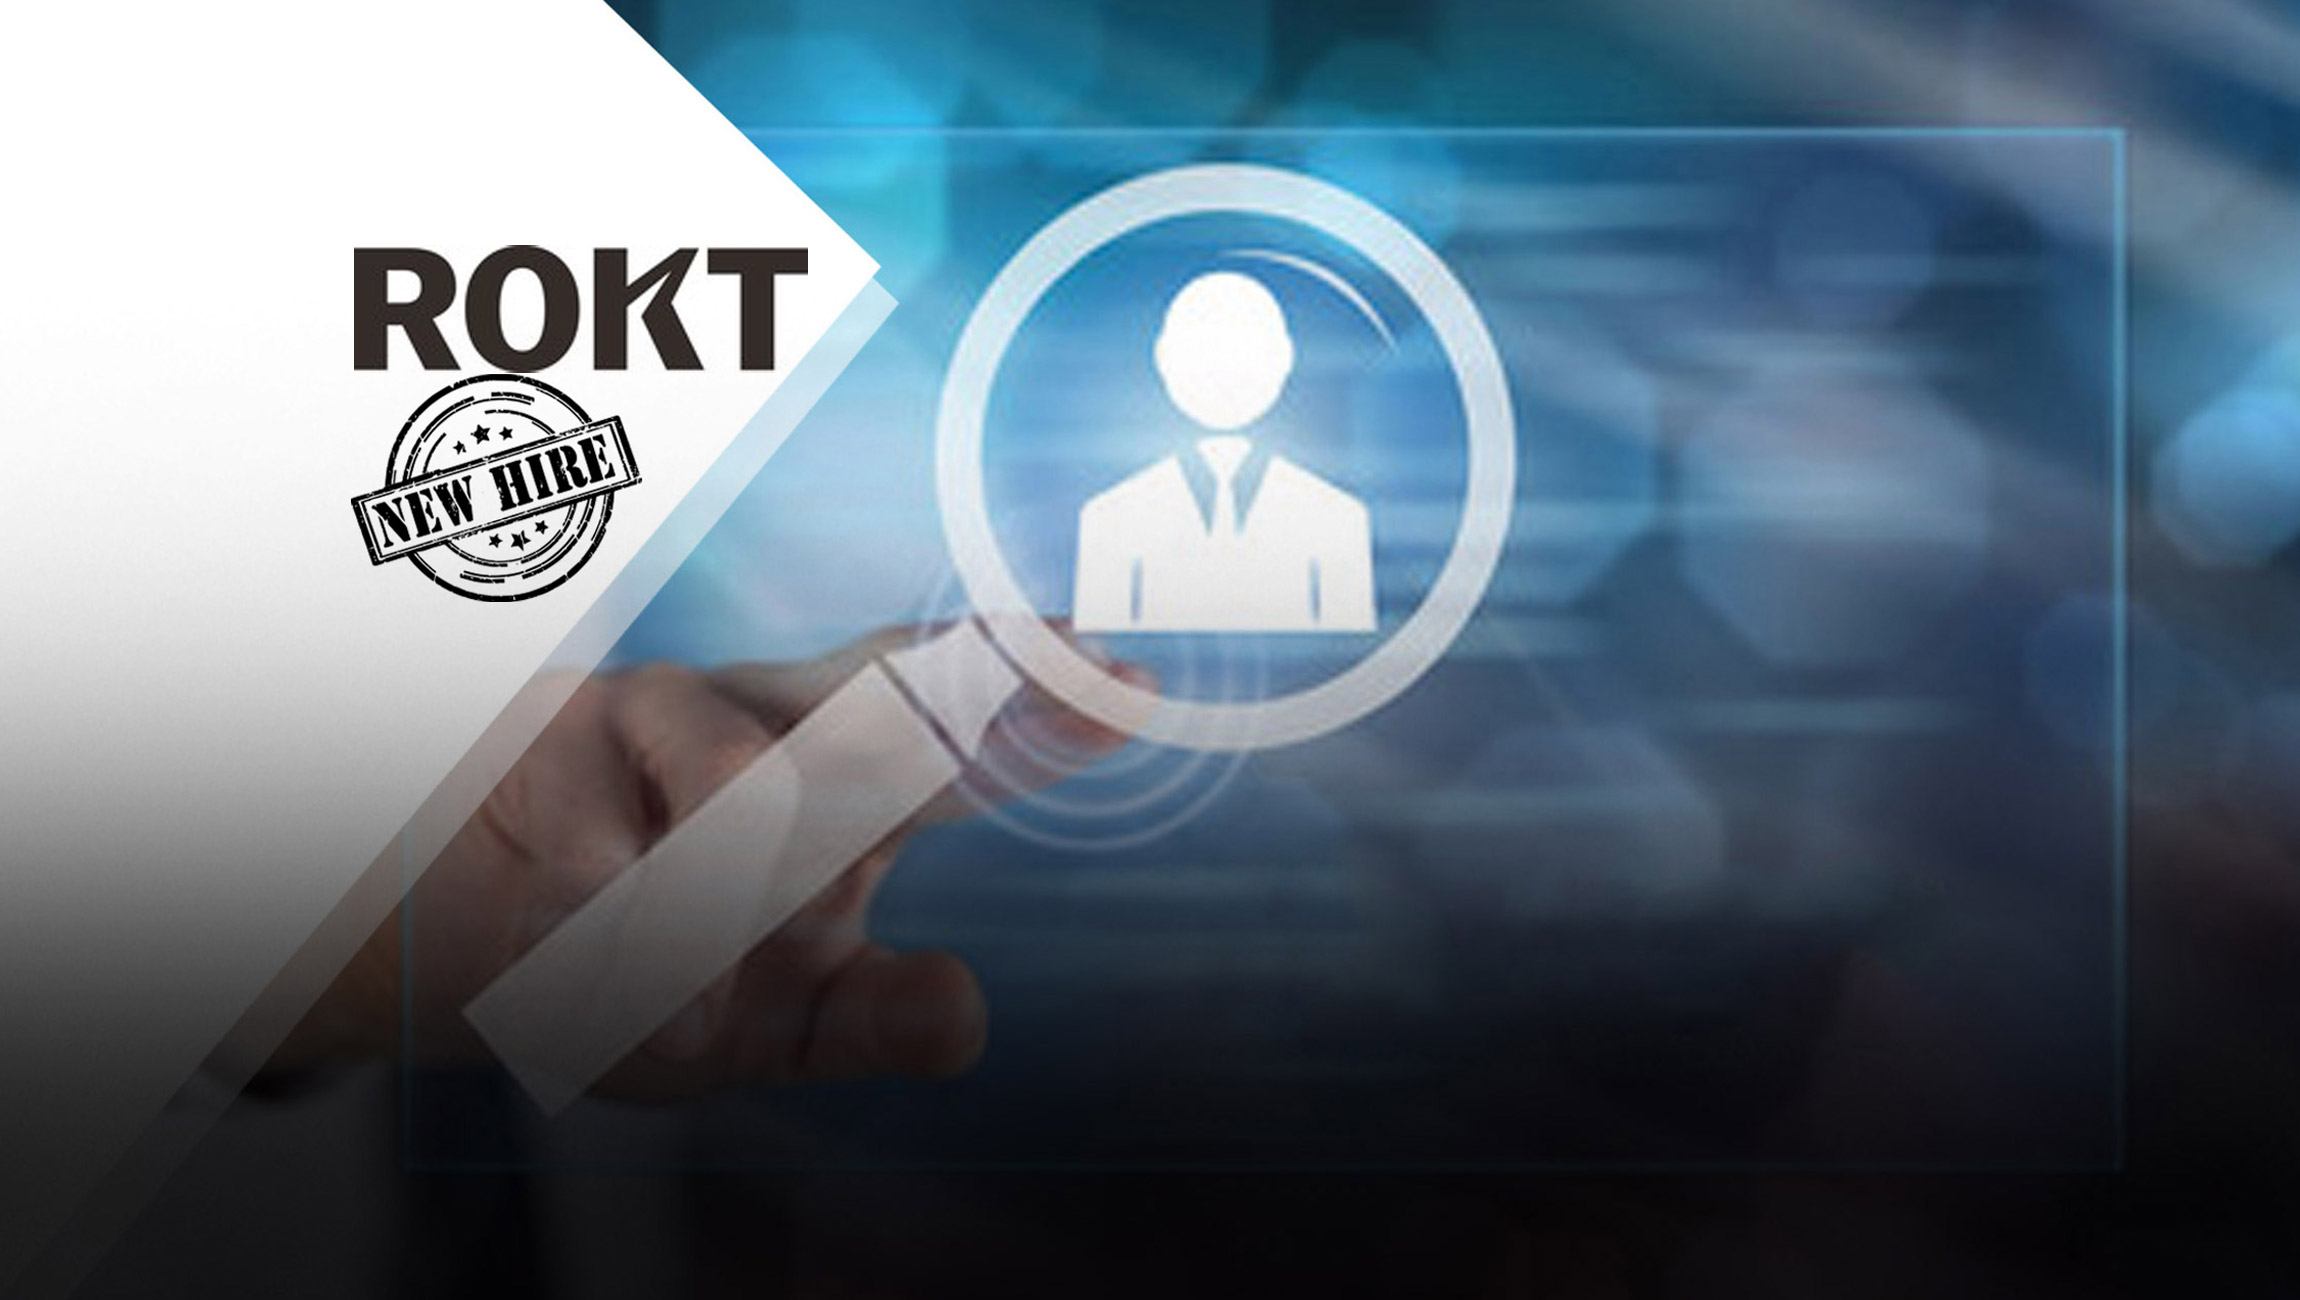 Rokt Joins Prestigious Makers Organization, Strengthening Commitment To Diversity